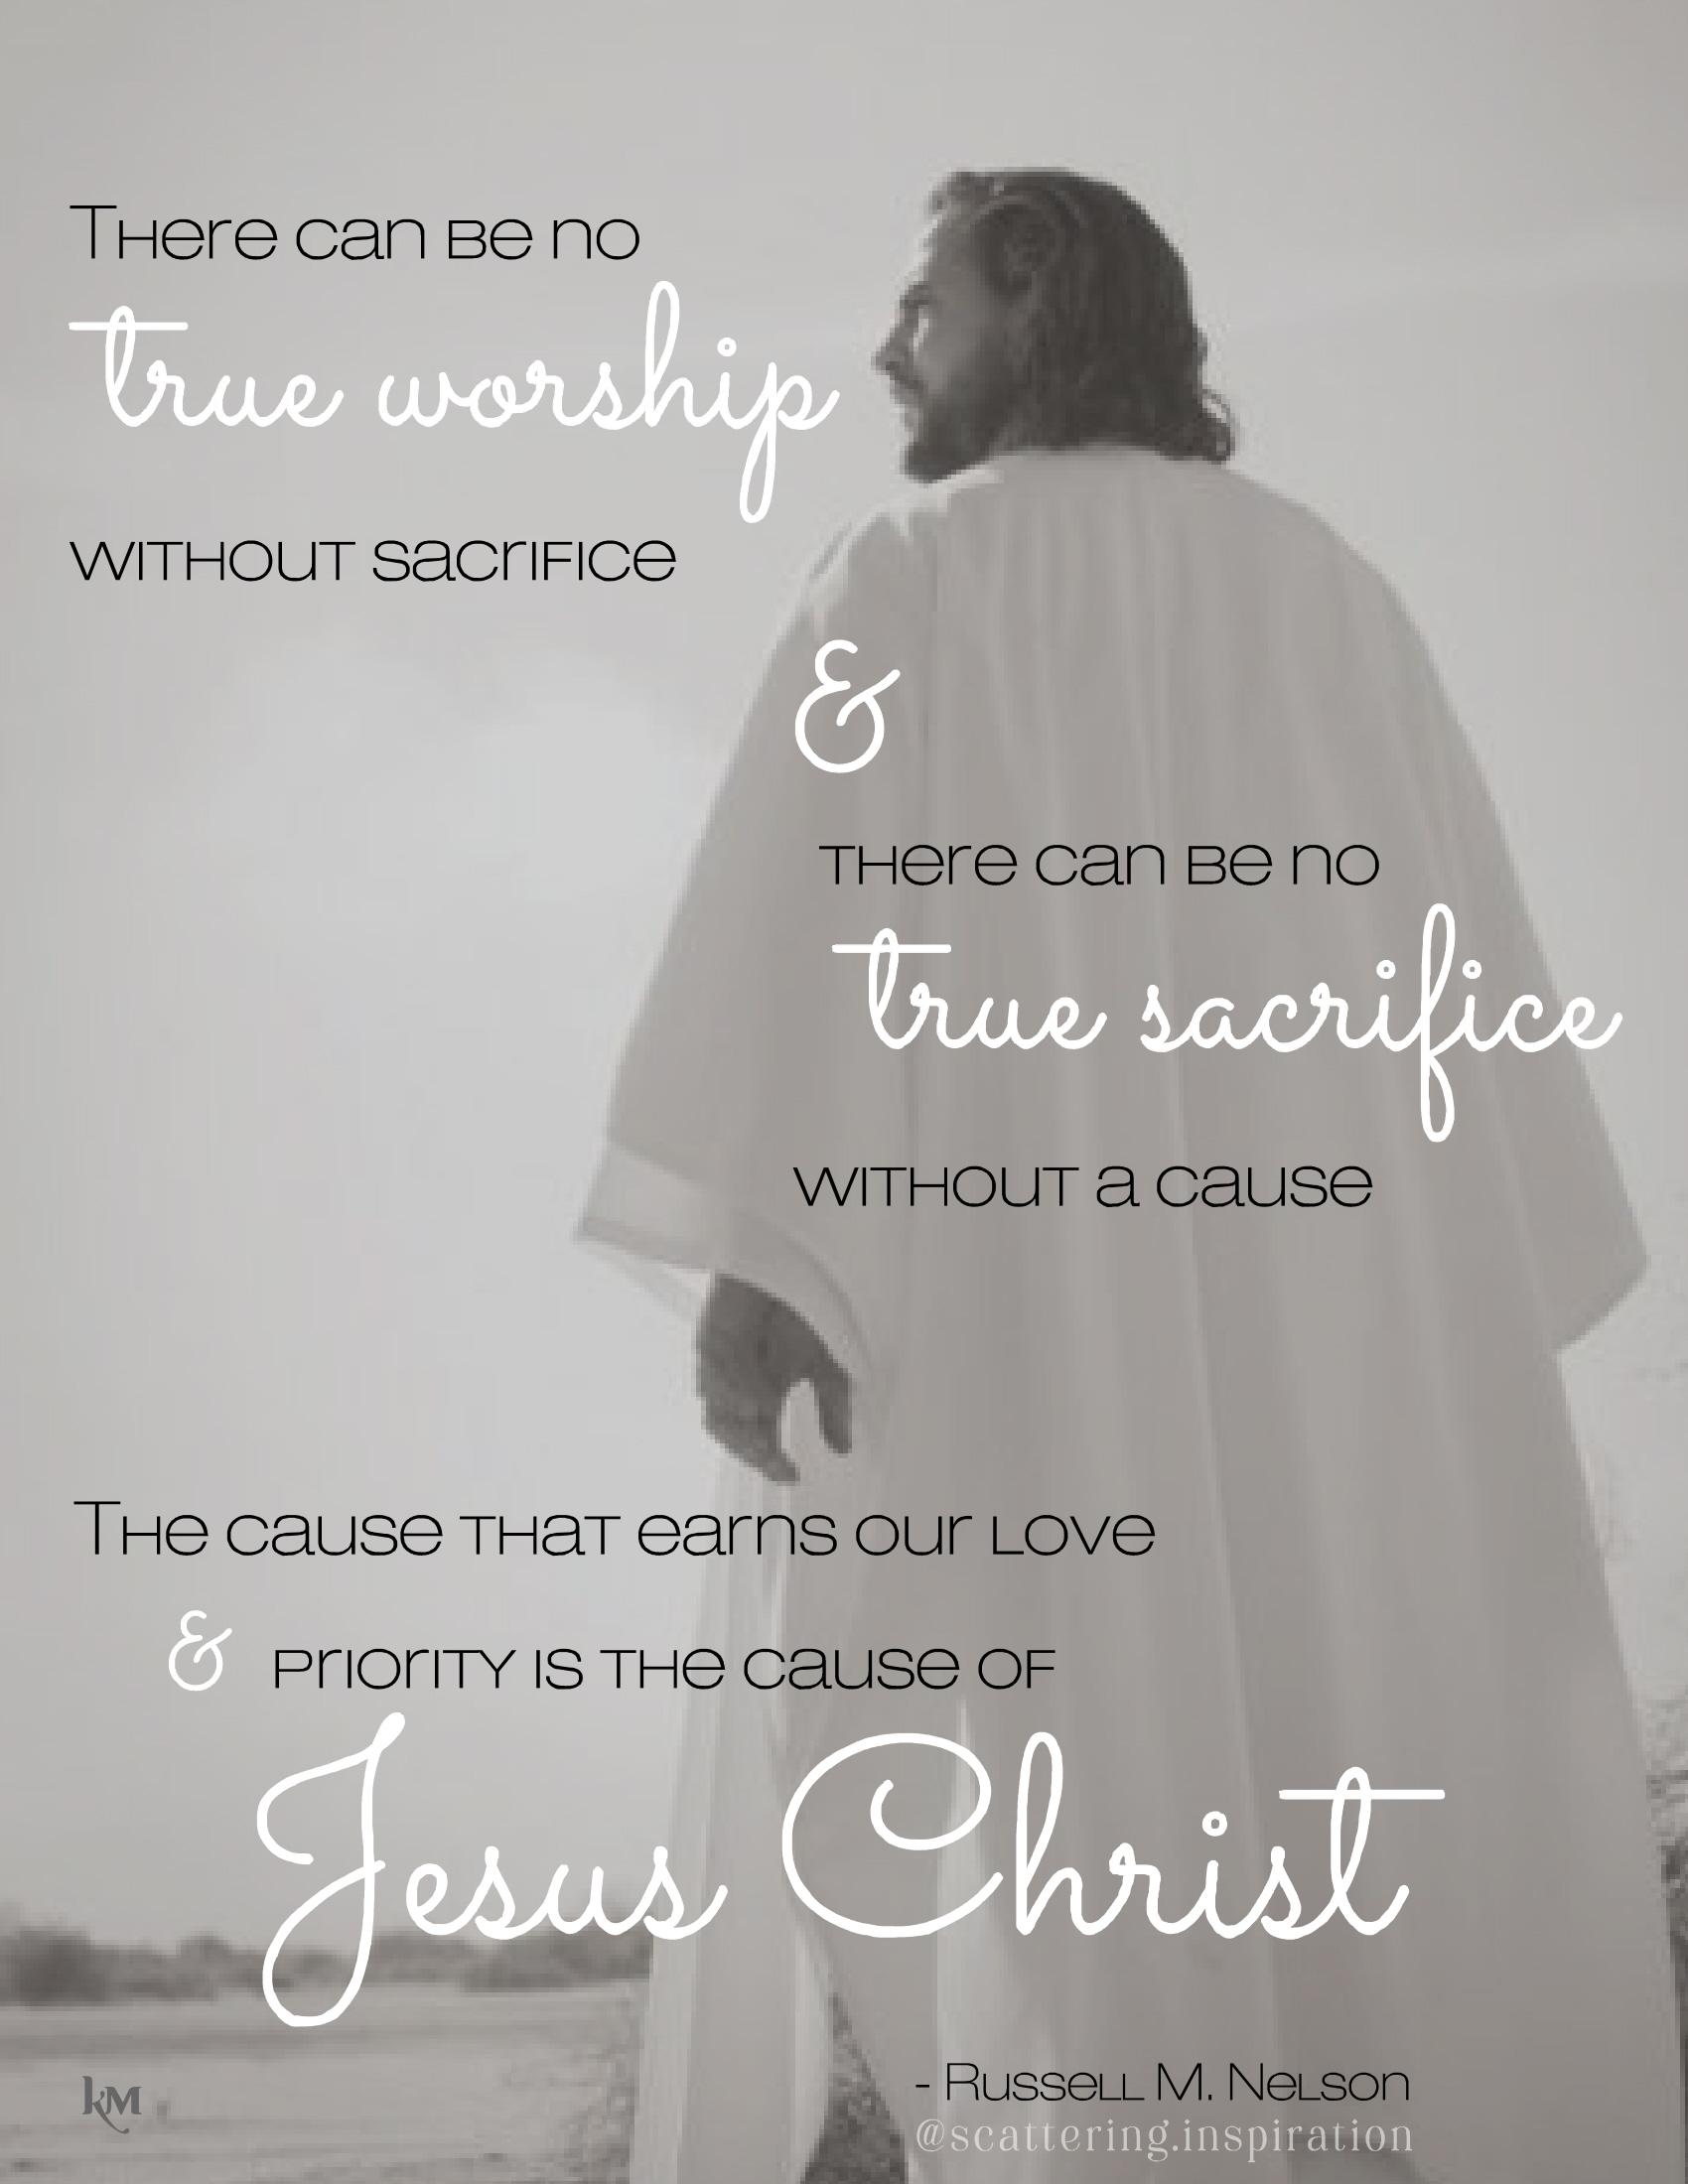 the cause of Jesus Christ